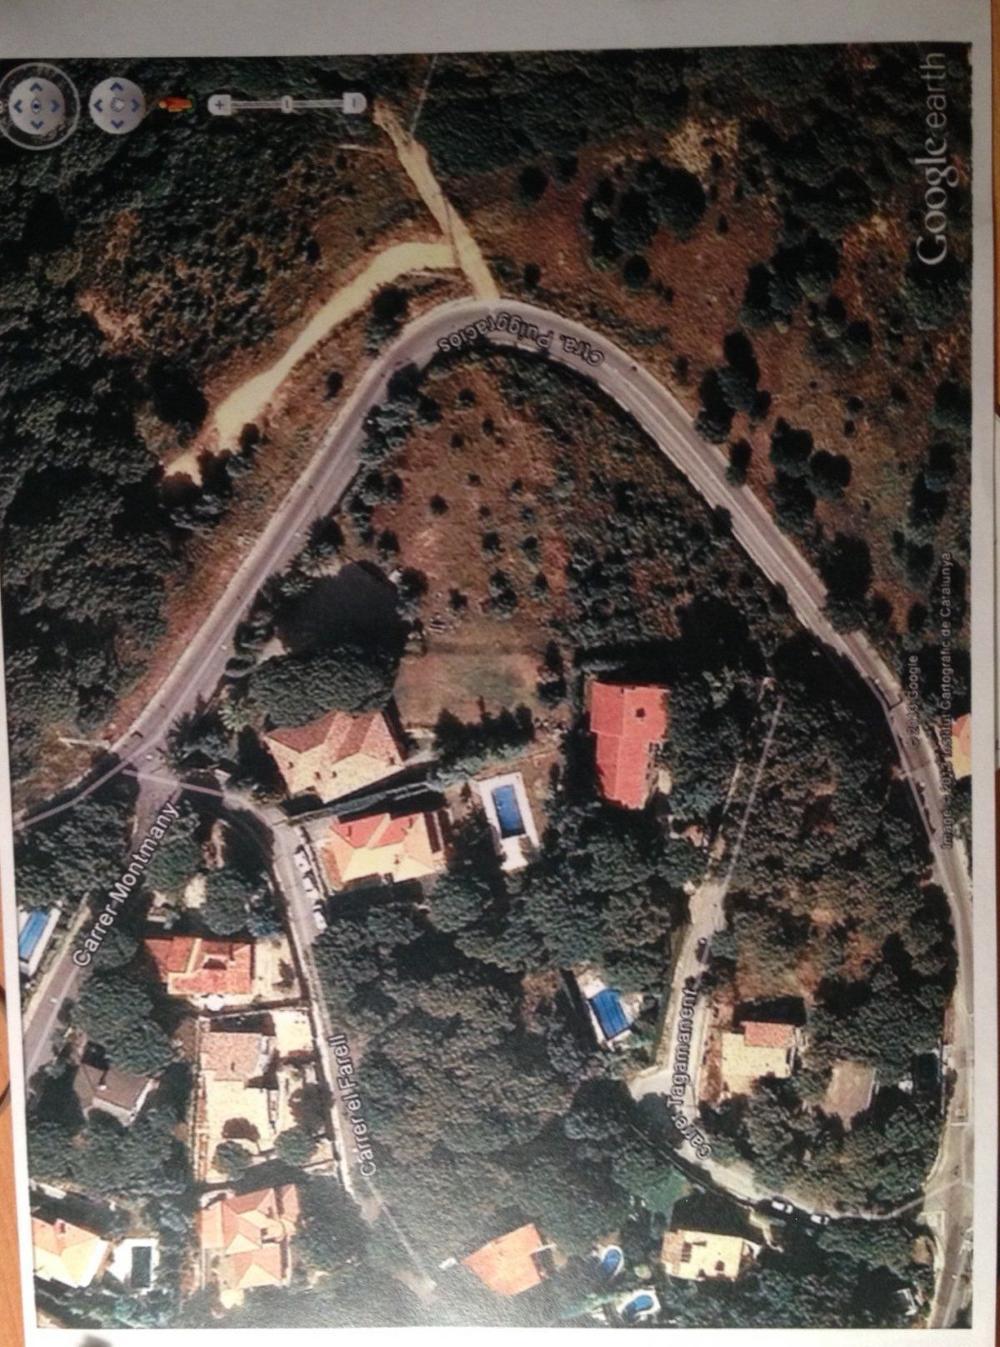 sant martí-el poblenou barcelona terreno foto 3383673